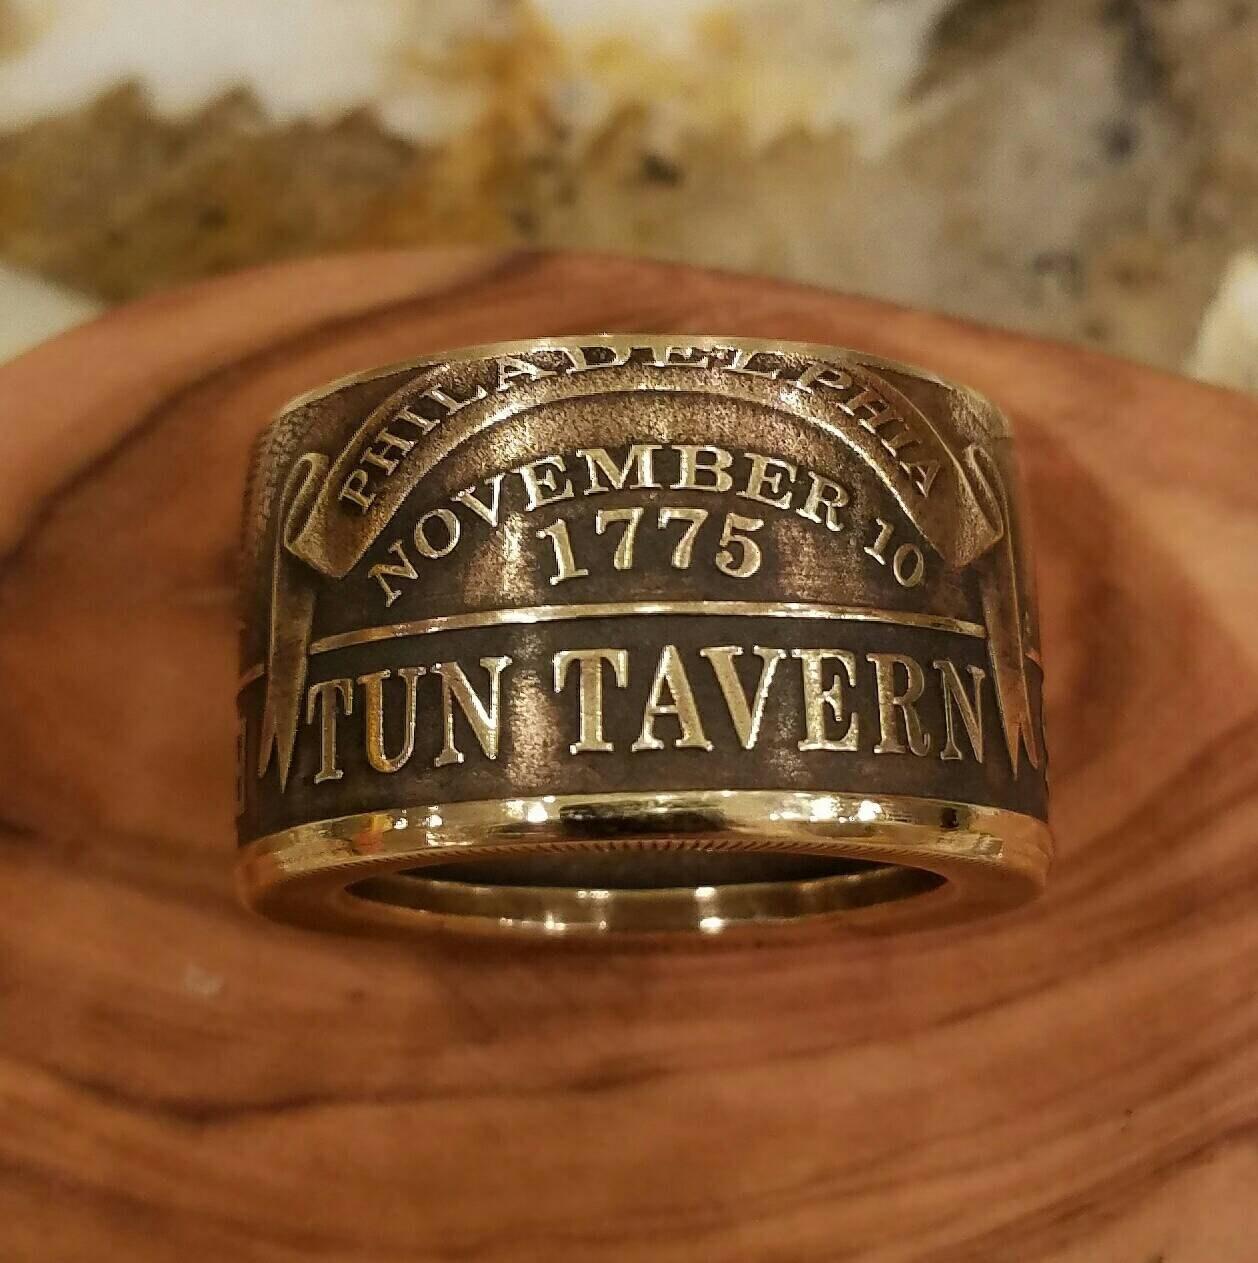 usmc ring usmc wedding band RCR Original US Marine Corps Tun Tavern Engravable Ring USMC Coin Ring Hand Forged